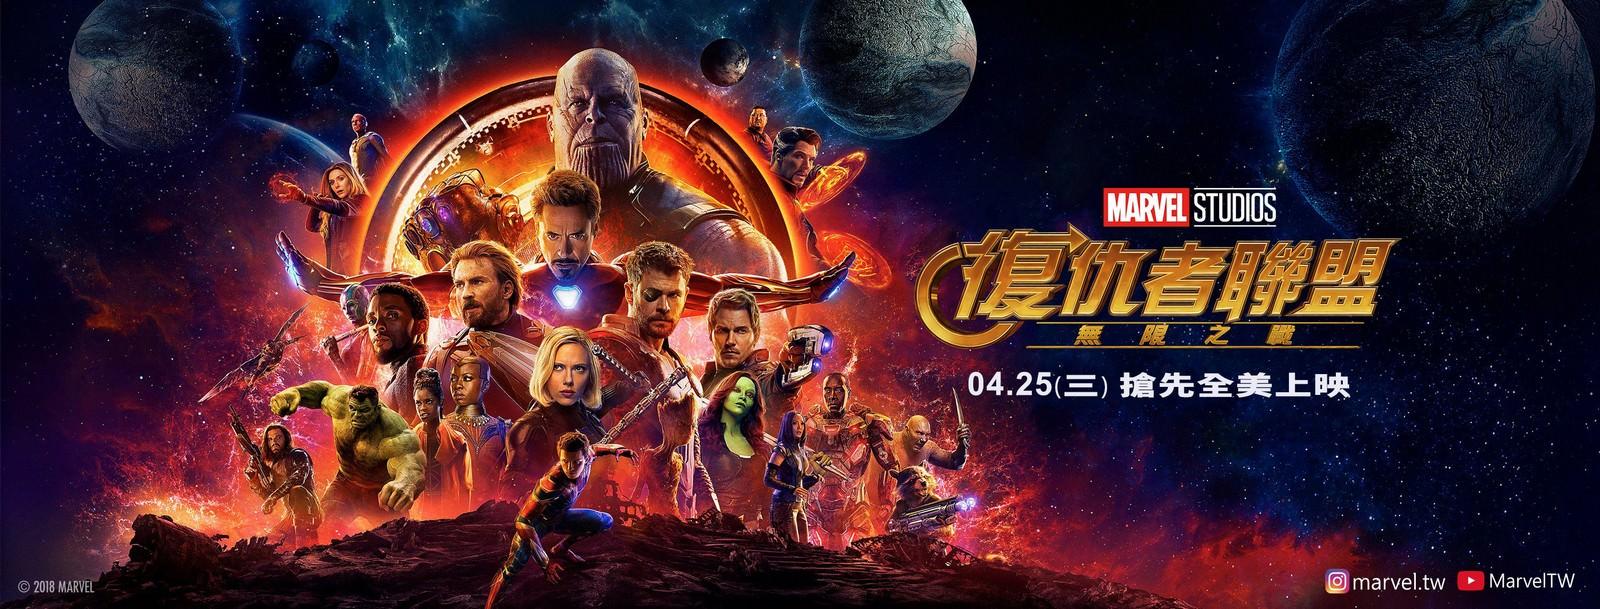 Movie, Avengers: Infinity War(美國) / 復仇者聯盟:無限之戰(台) / 复仇者联盟3:无限战争(中) / 復仇者聯盟3:無限之戰(港), 電影海報, 台灣, 橫版